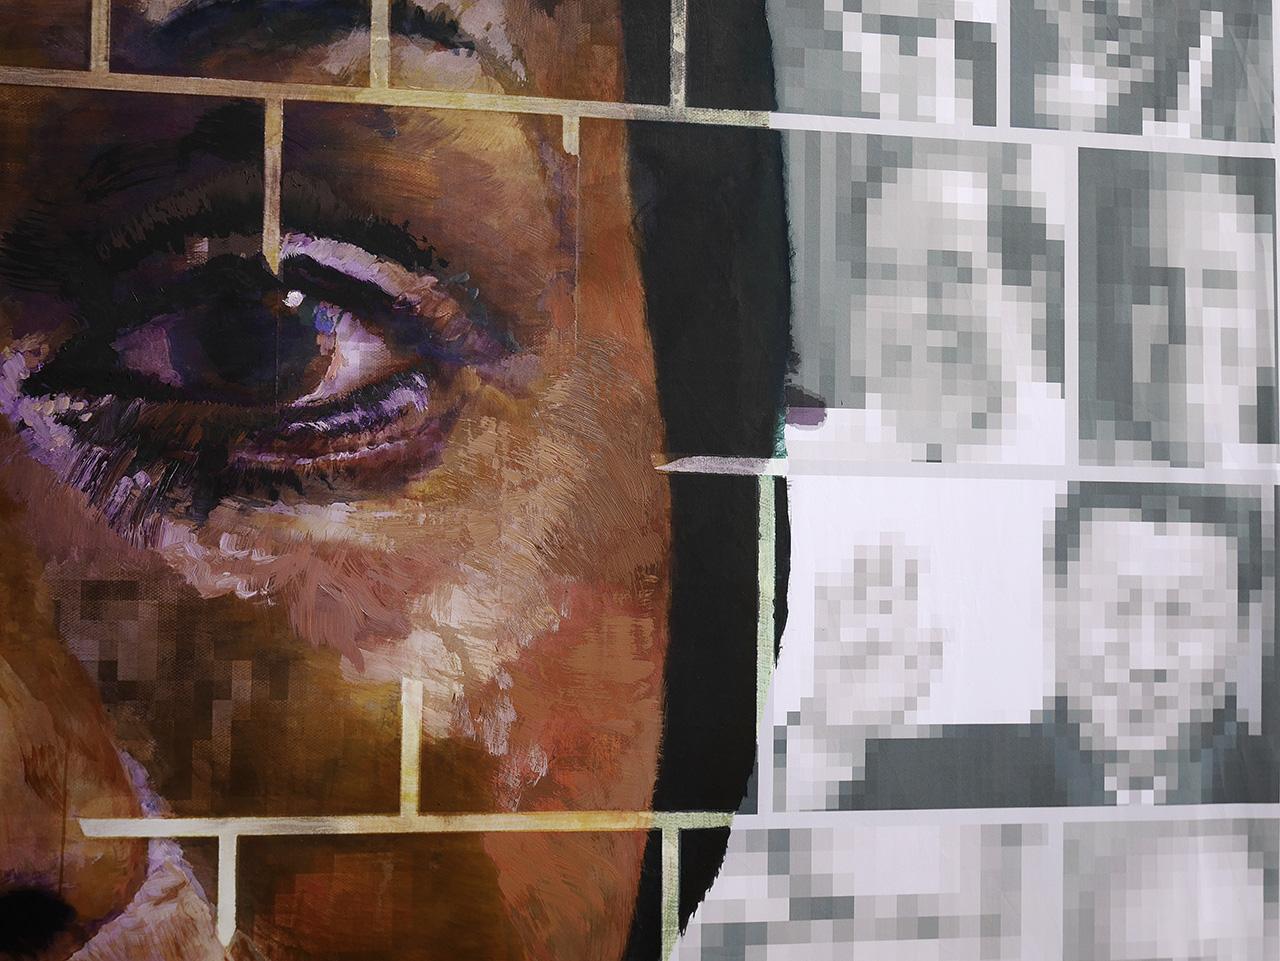 Où aller? Going where? Young woman. Detail 2. Acrylic paint on print 250 x 350cm. For Yango Biennale 2014. Congo Kinshasa